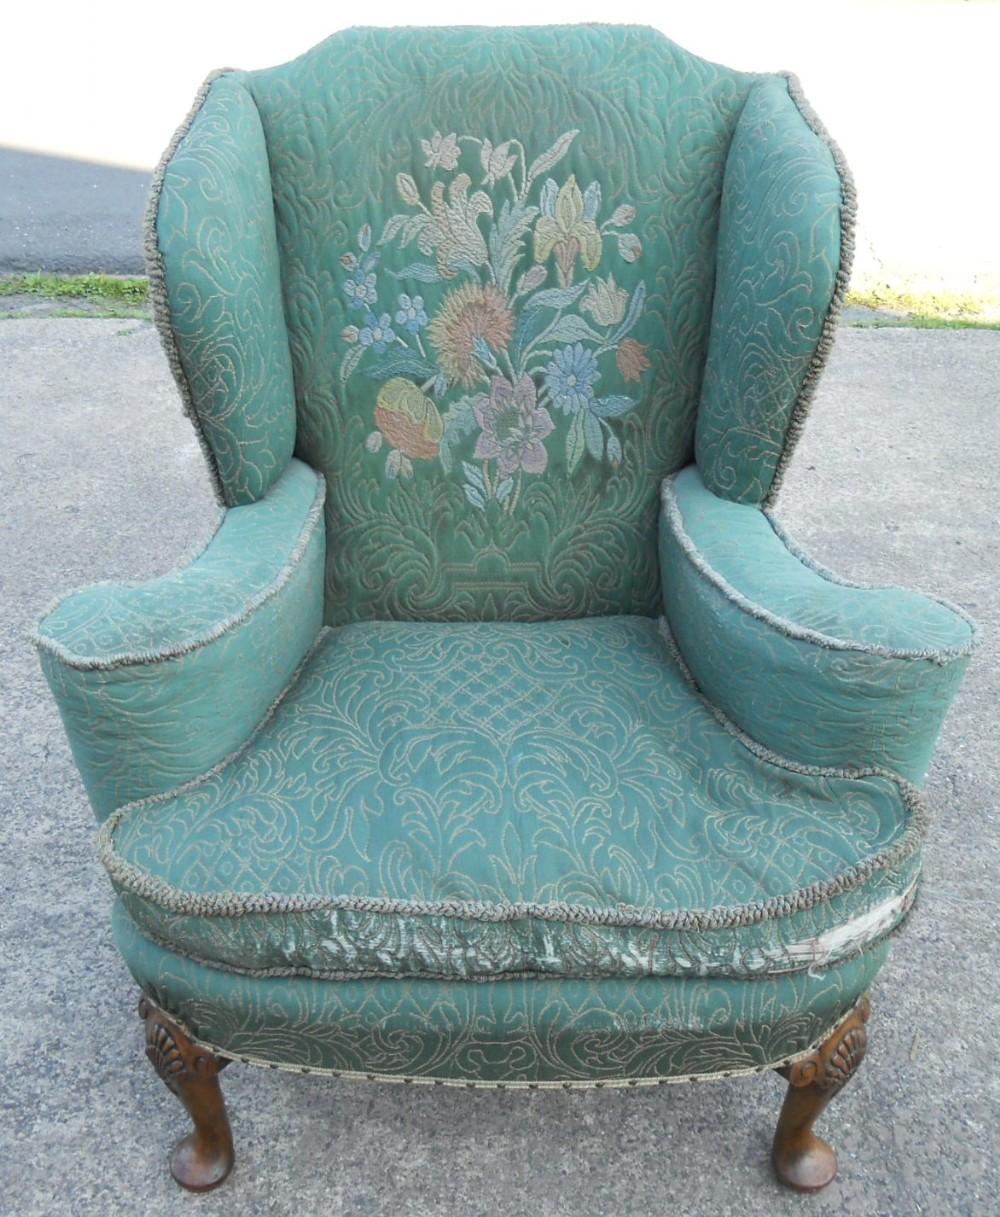 Wingback Upholstered Fireside Armchair | 238650 ...